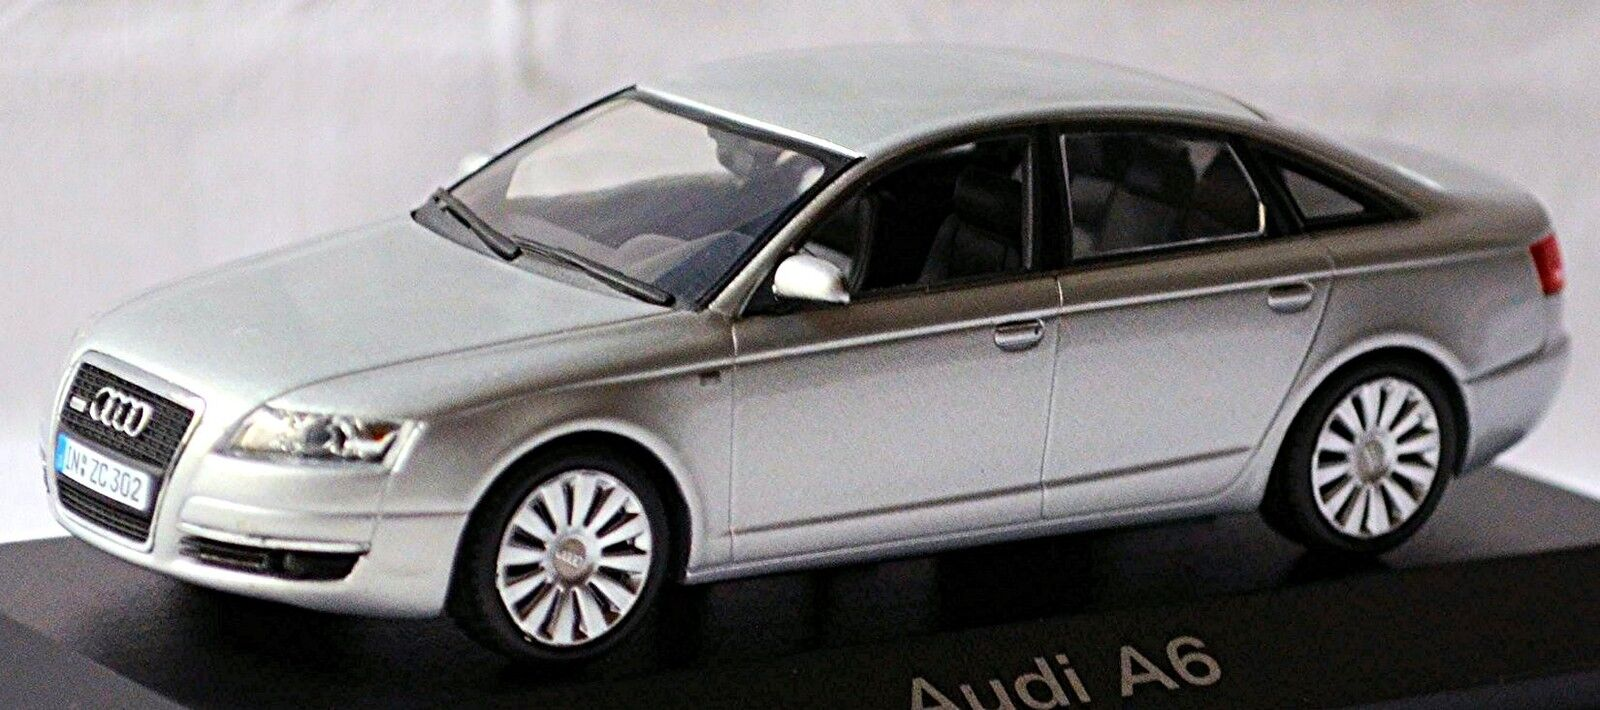 Audi A6 Sedán C6 Tipo  4f 2004-08 Luz Plateada plata Metálico 1 43